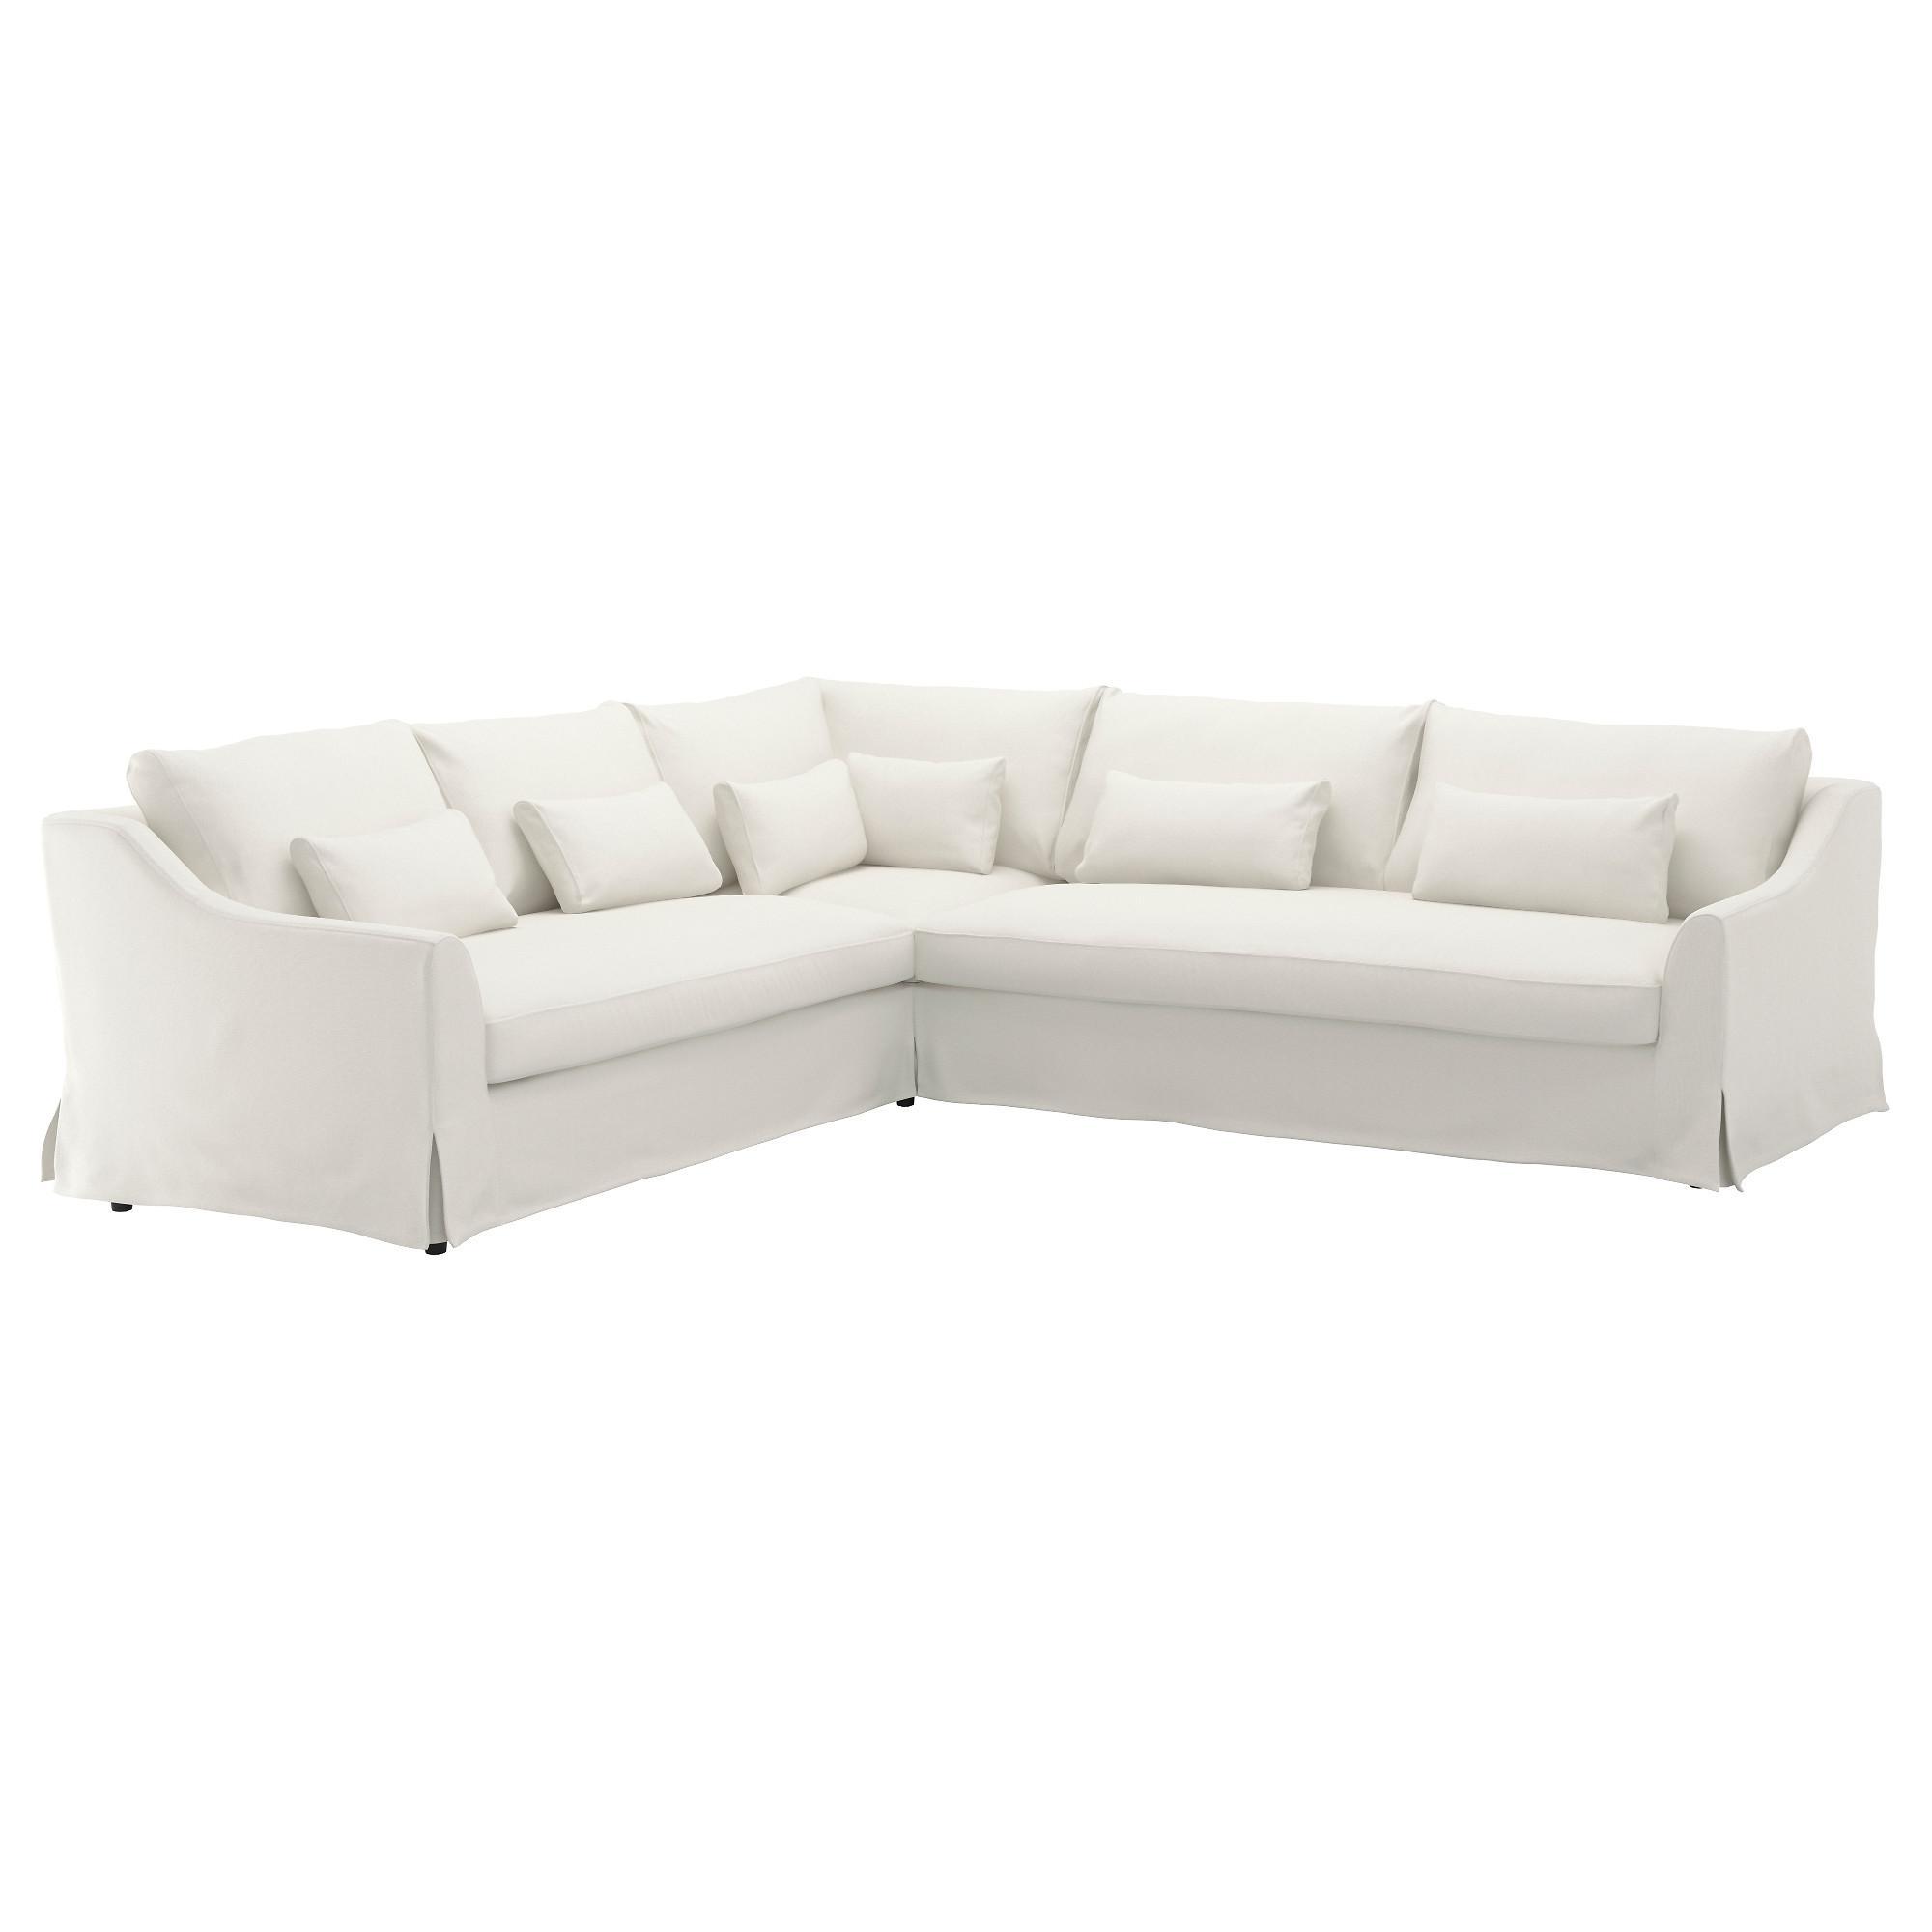 Fabric Sectional Sofas – Ikea Regarding Ikea Sectional Sofa Bed (View 16 of 20)